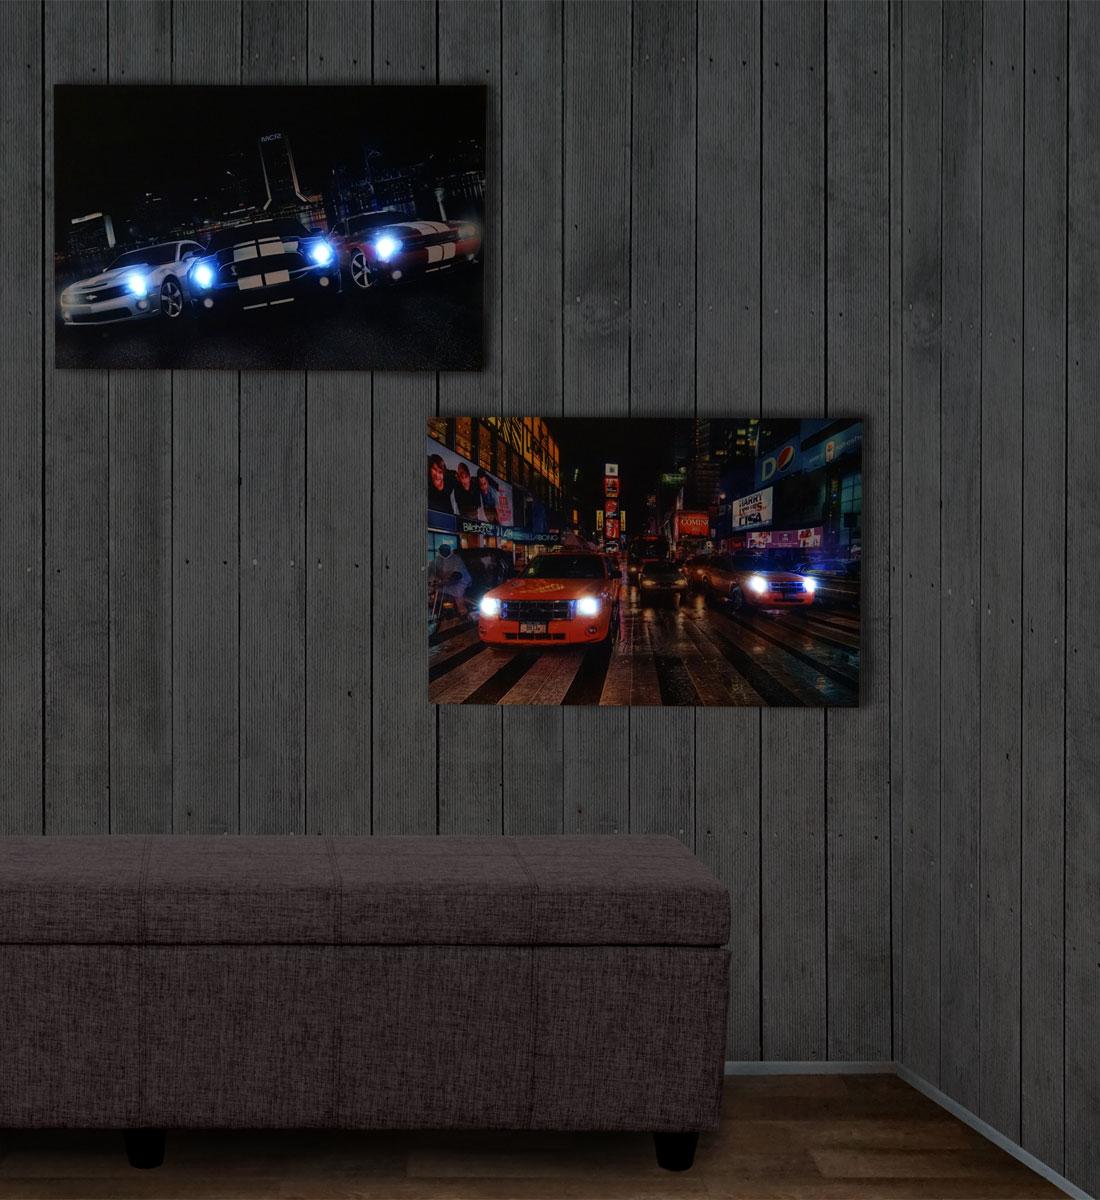 2x led bild mit beleuchtung leinwandbild wandbild wandtattoo beleuchtet autos ebay. Black Bedroom Furniture Sets. Home Design Ideas